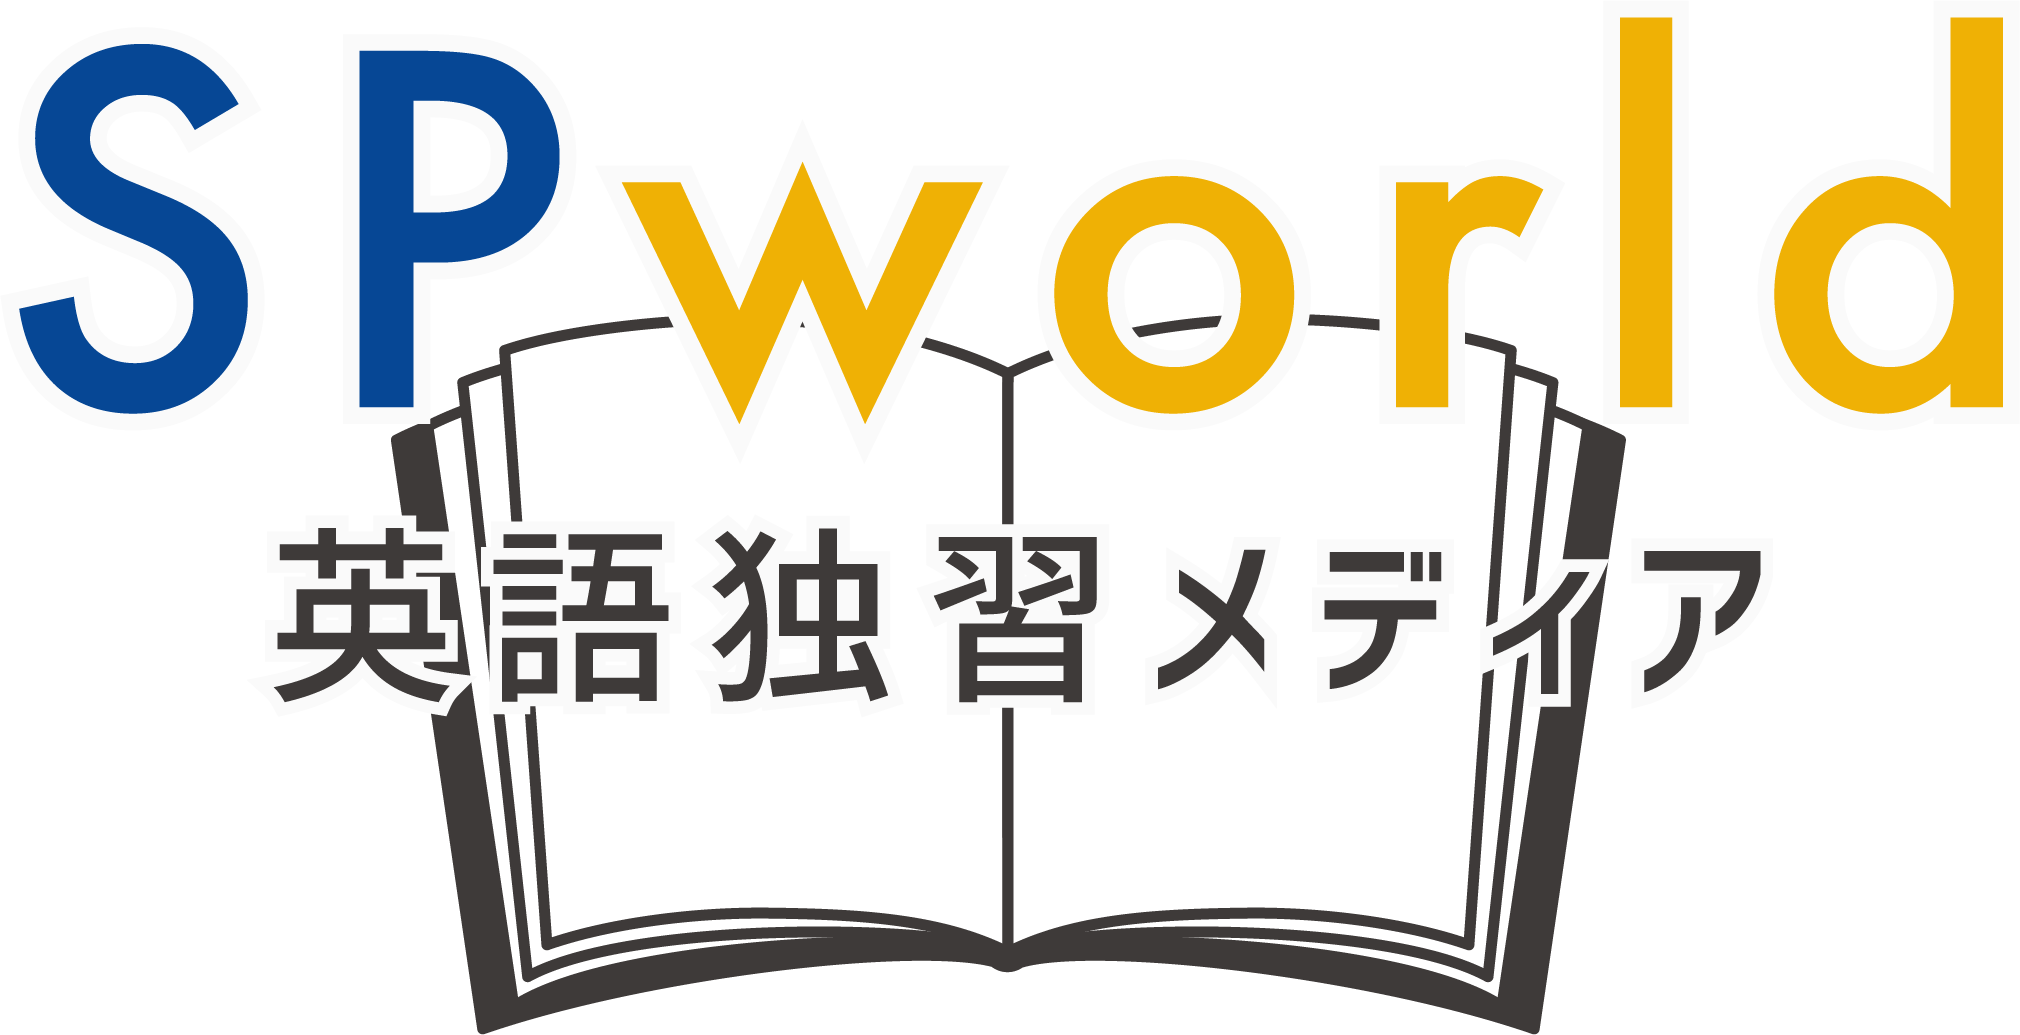 SP-WORLD 英語独習メディア